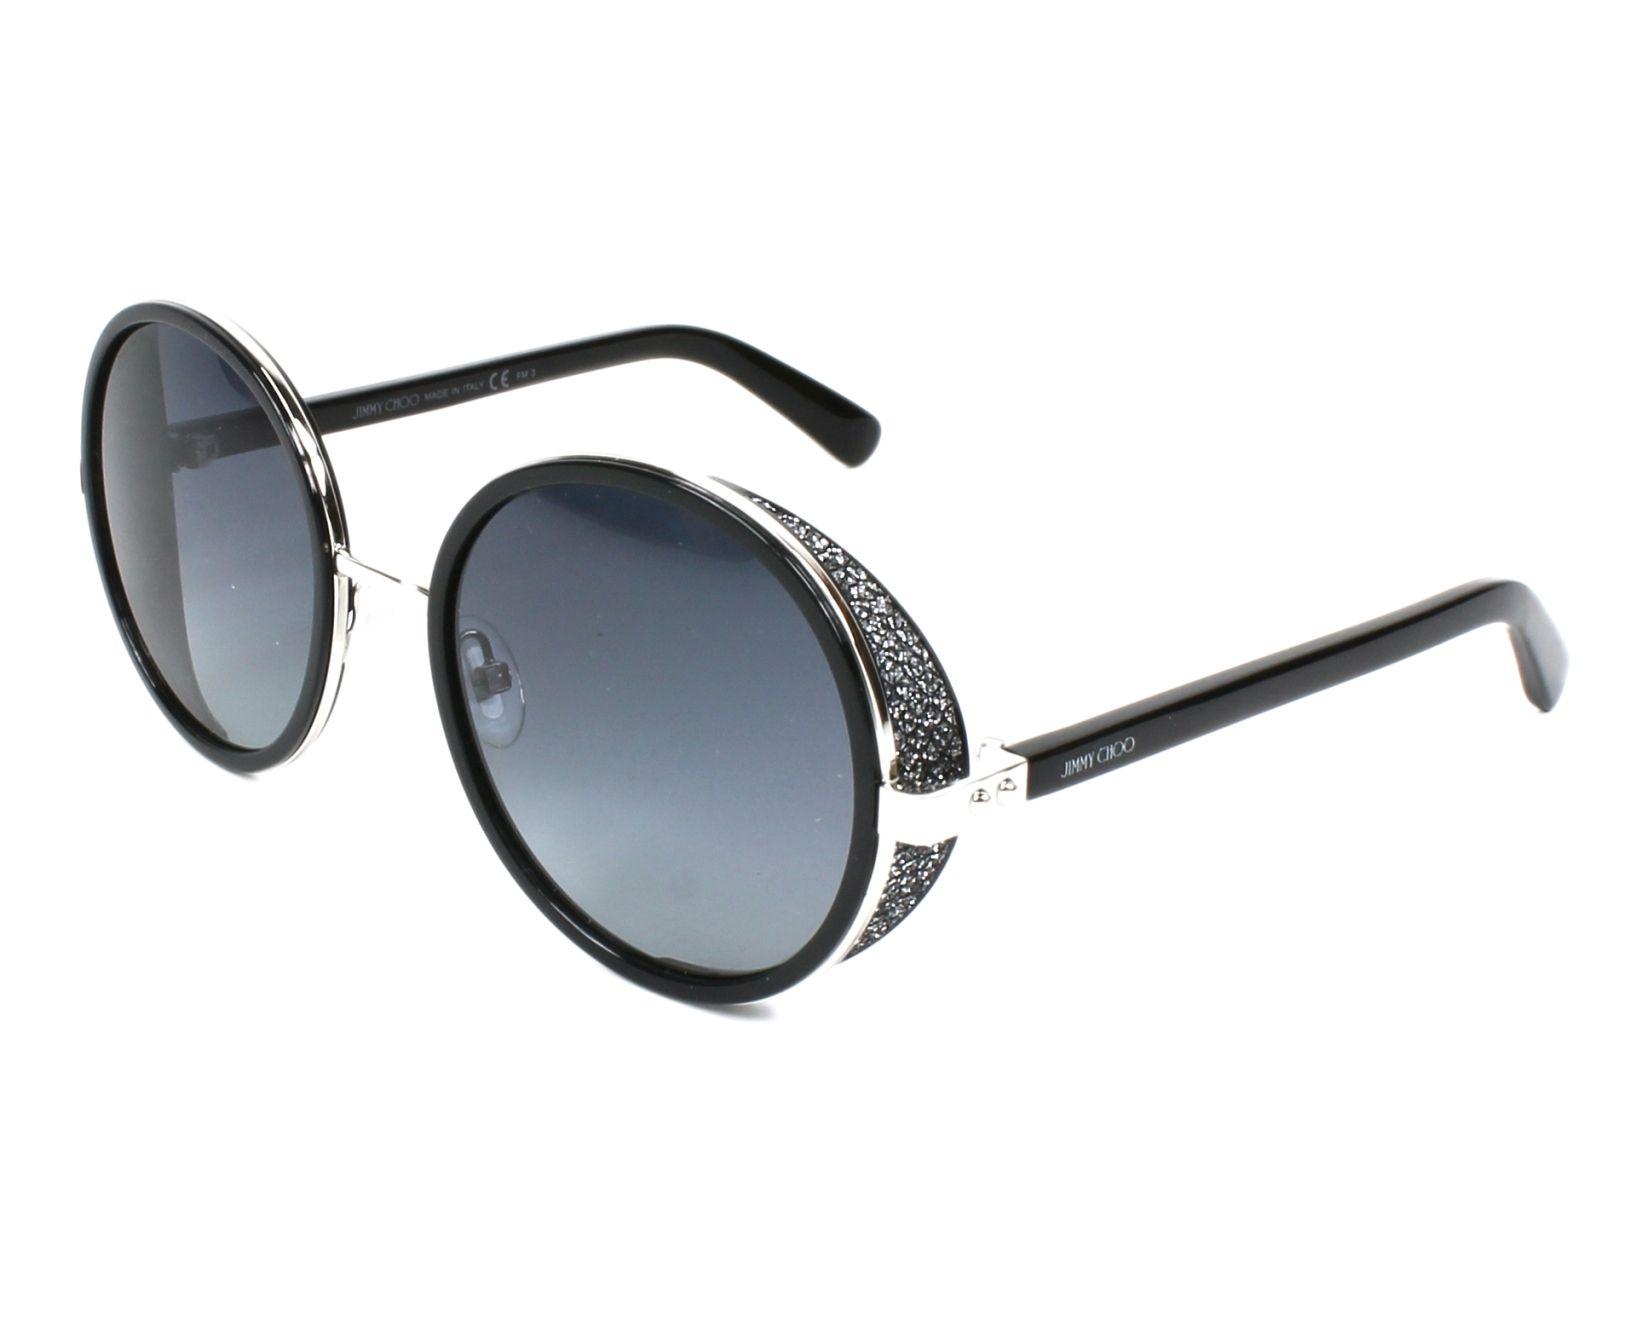 Jimmy Choo Andie/N/S B1A HD Sonnenbrille Vm86Uxr